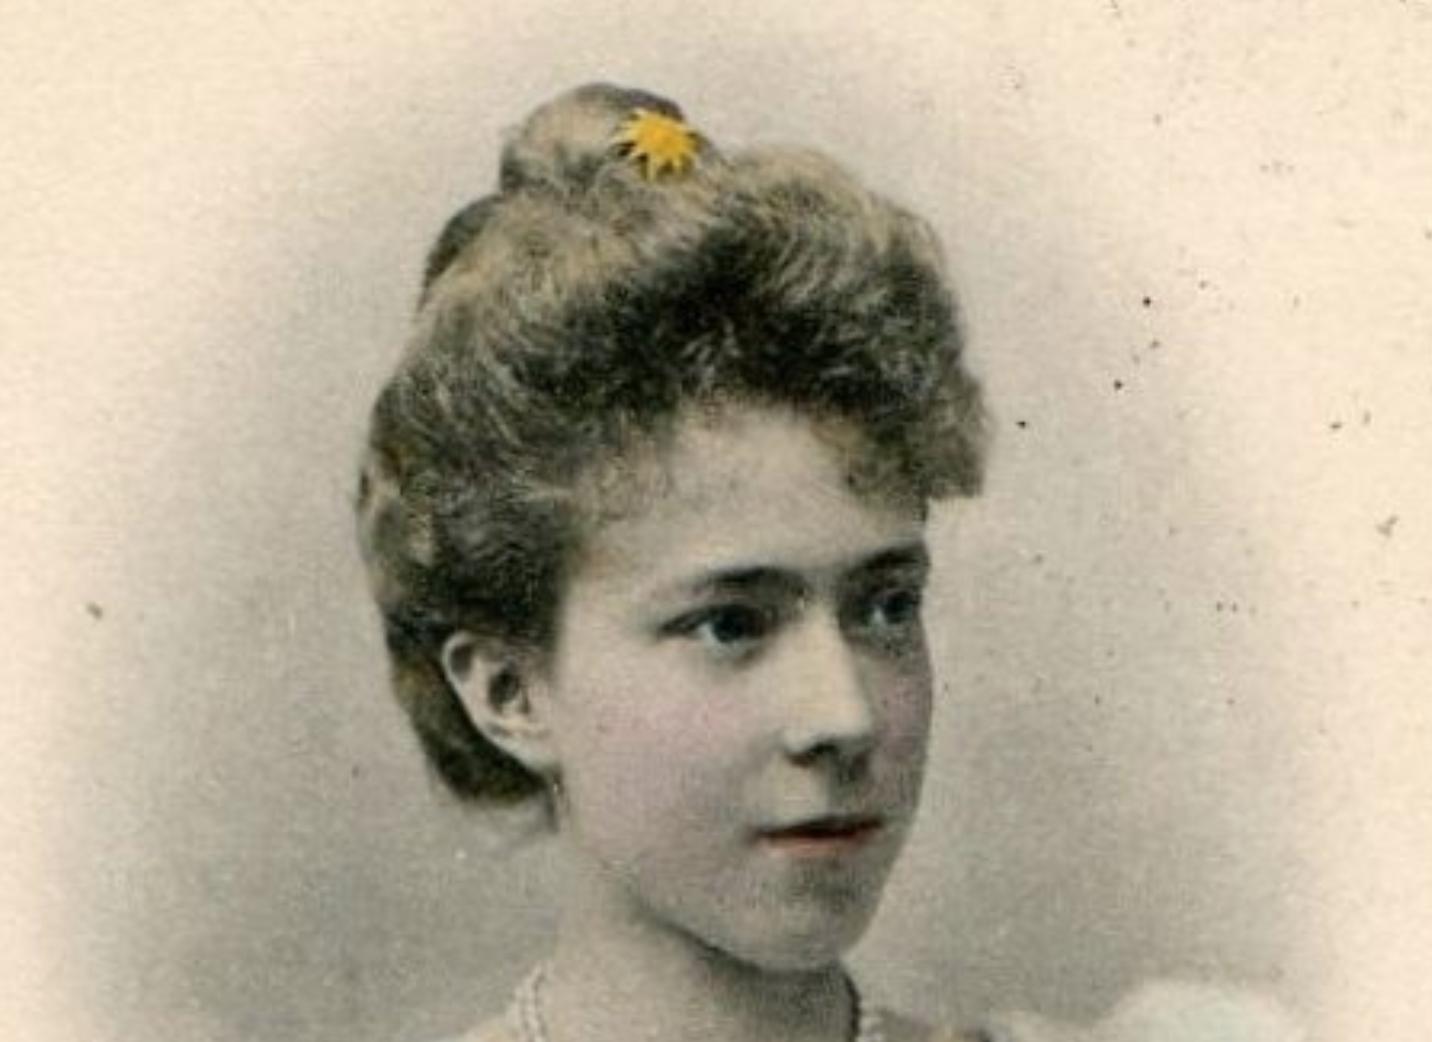 Elisabetta. Wittelsbach e regina